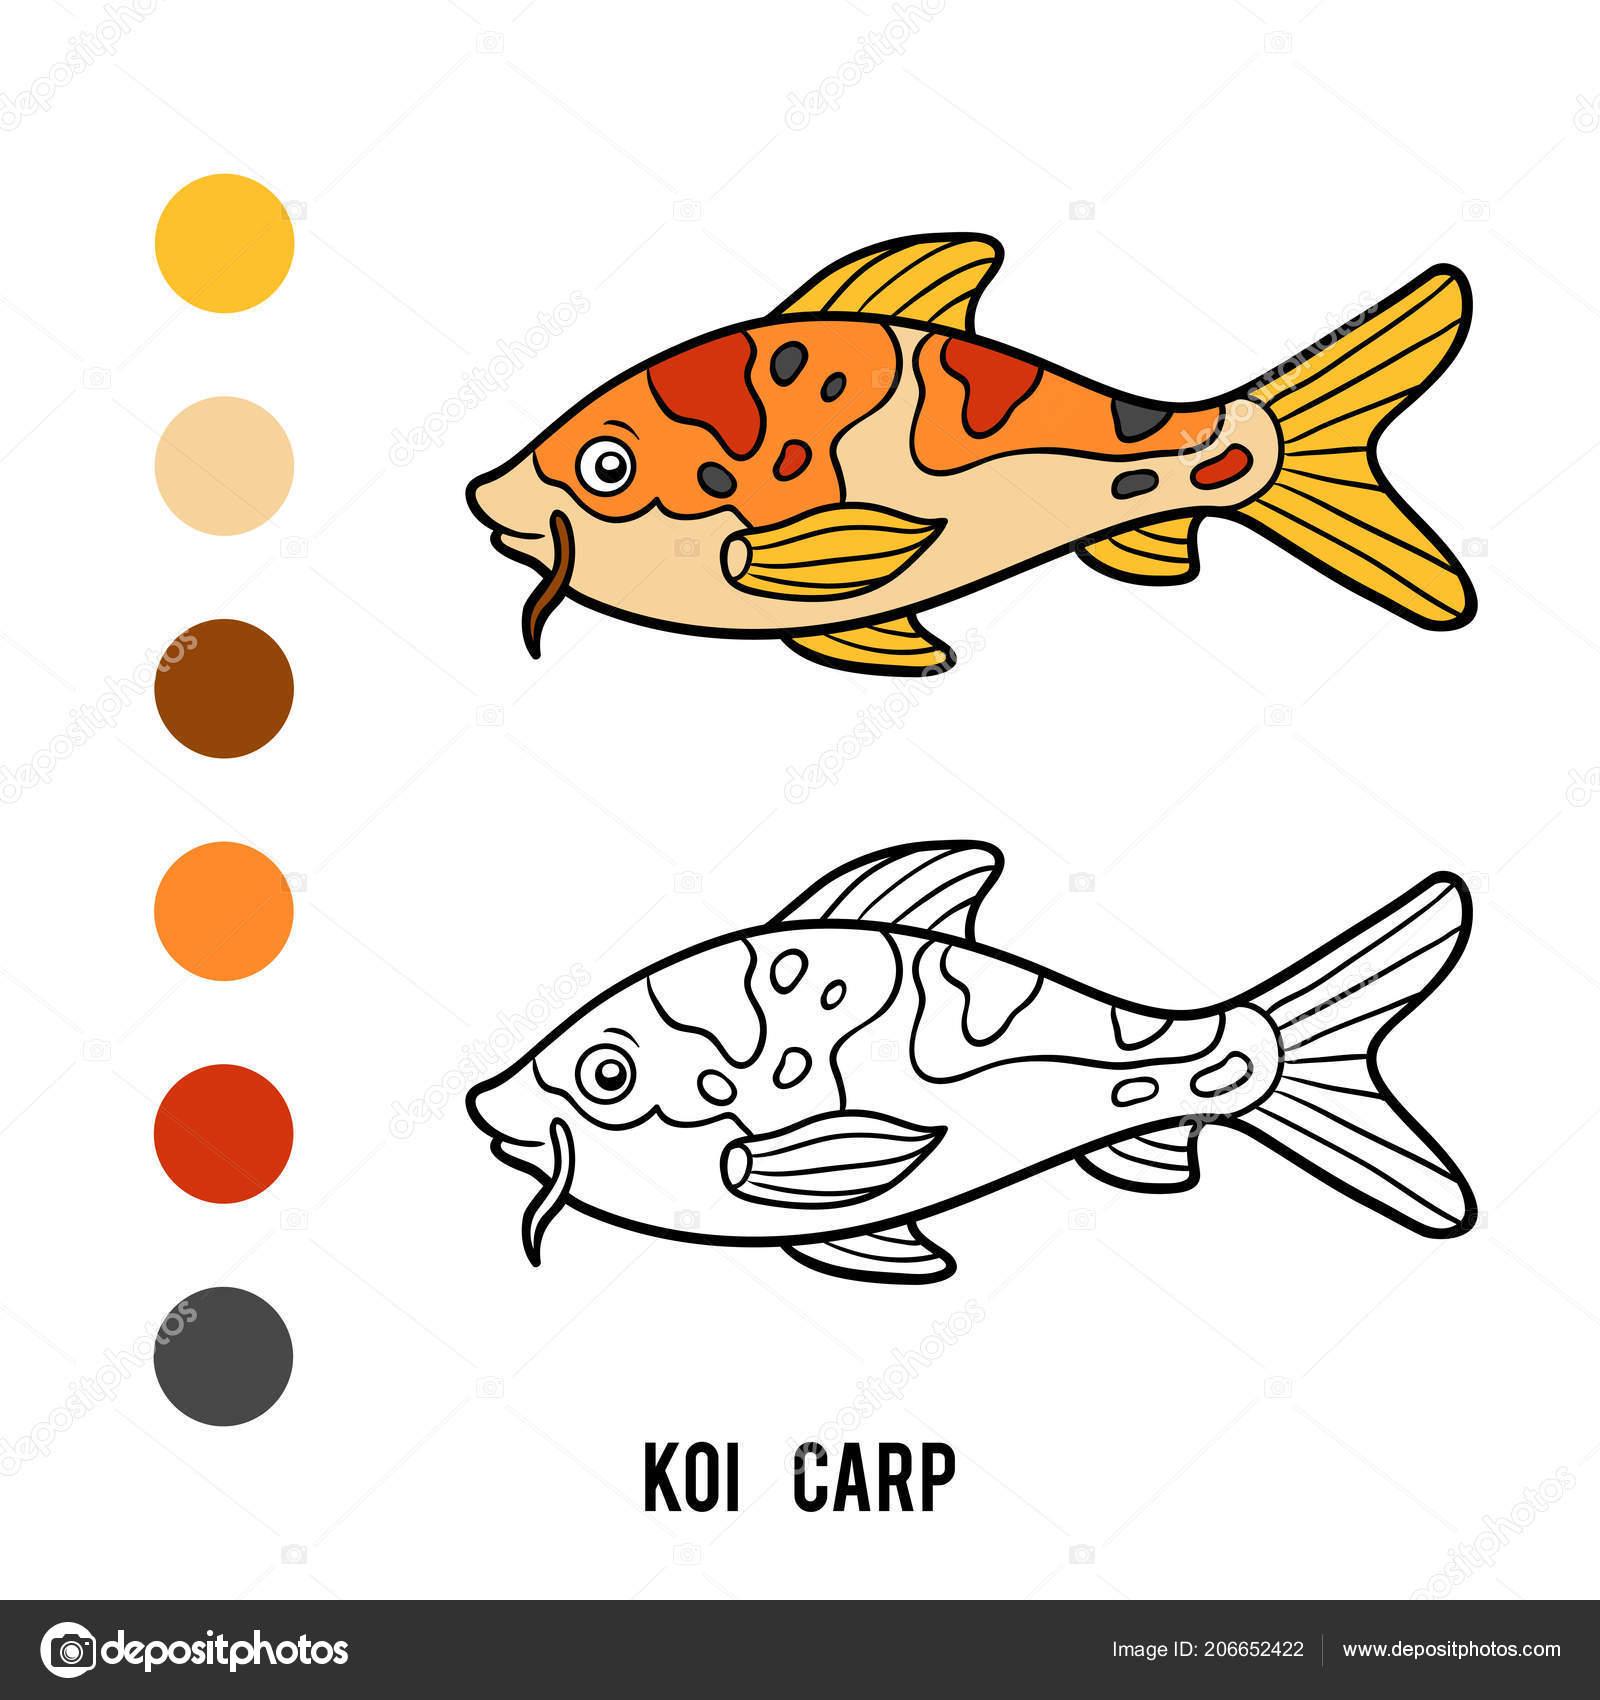 Coloring Book Children Cartoon Animal Koi Carp Stock Vector